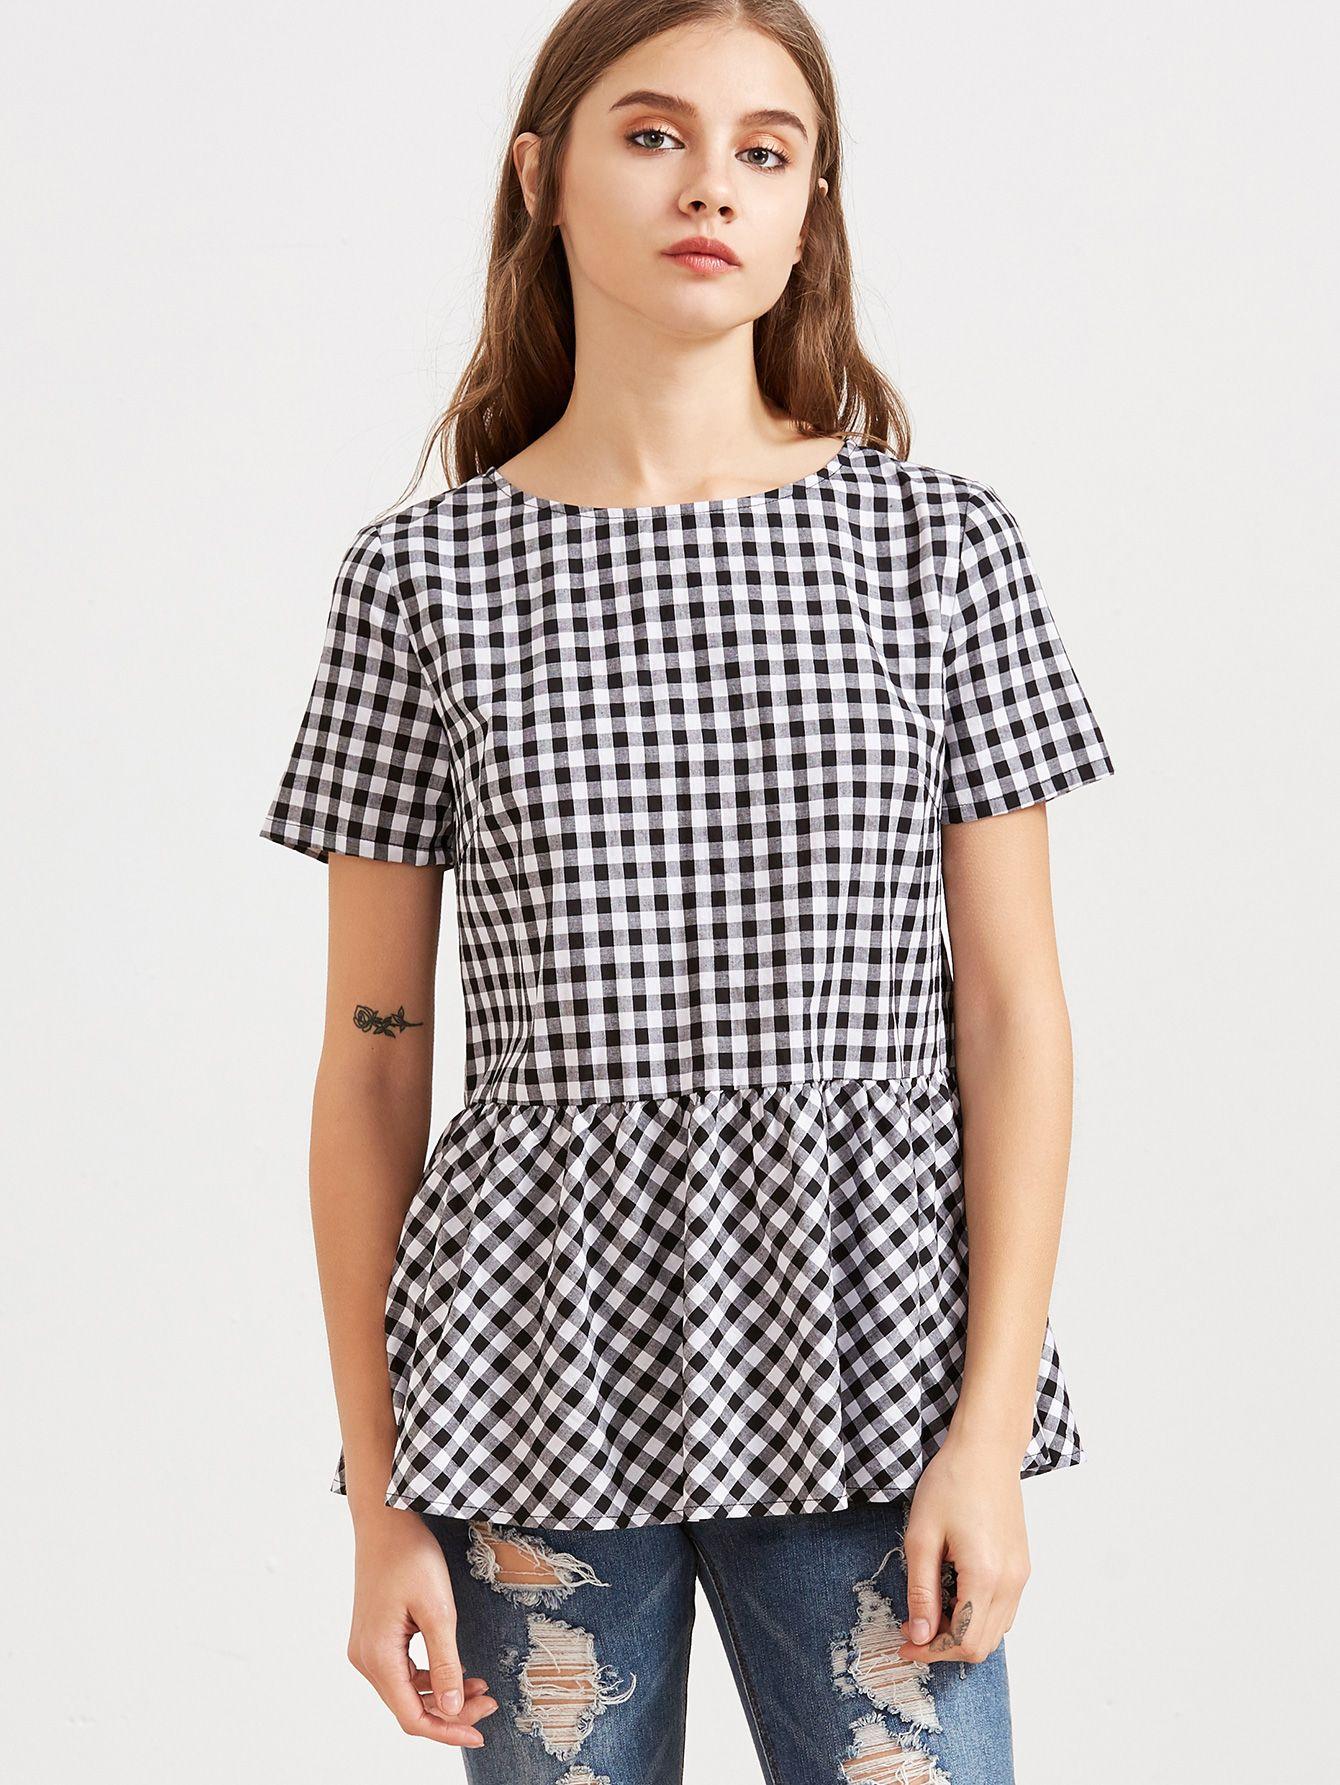 863830d6b3dbcf Black And White Checkered Bow Split Back Peplum Top -SheIn(Sheinside ...